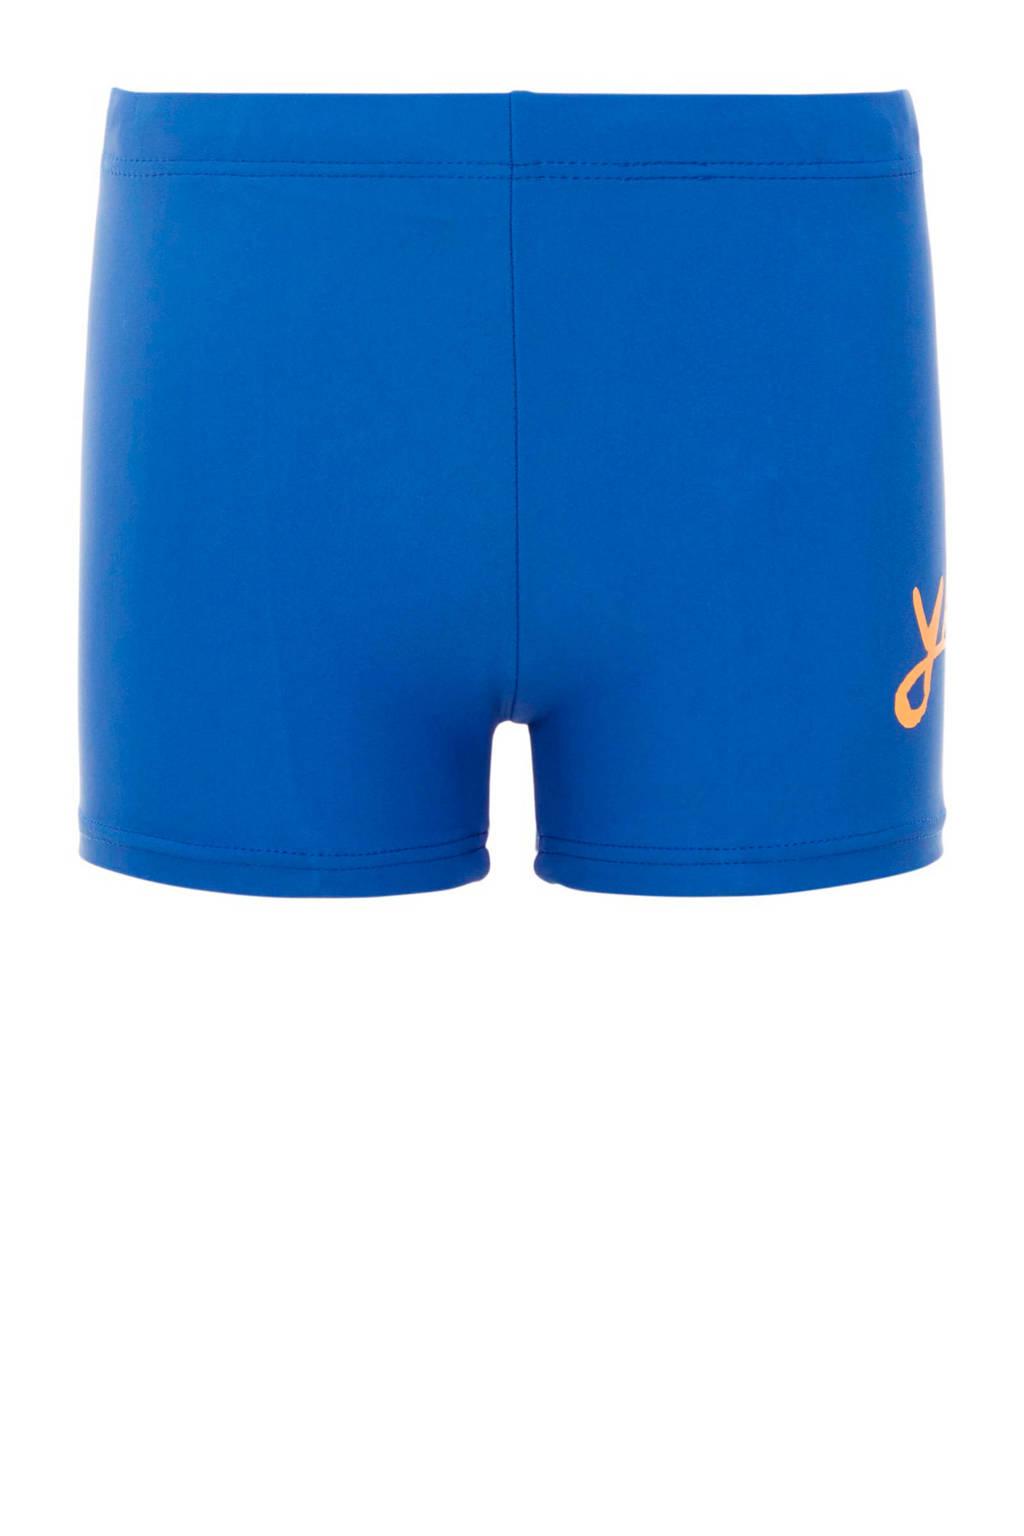 NAME IT zwemboxer blauw, Blauw